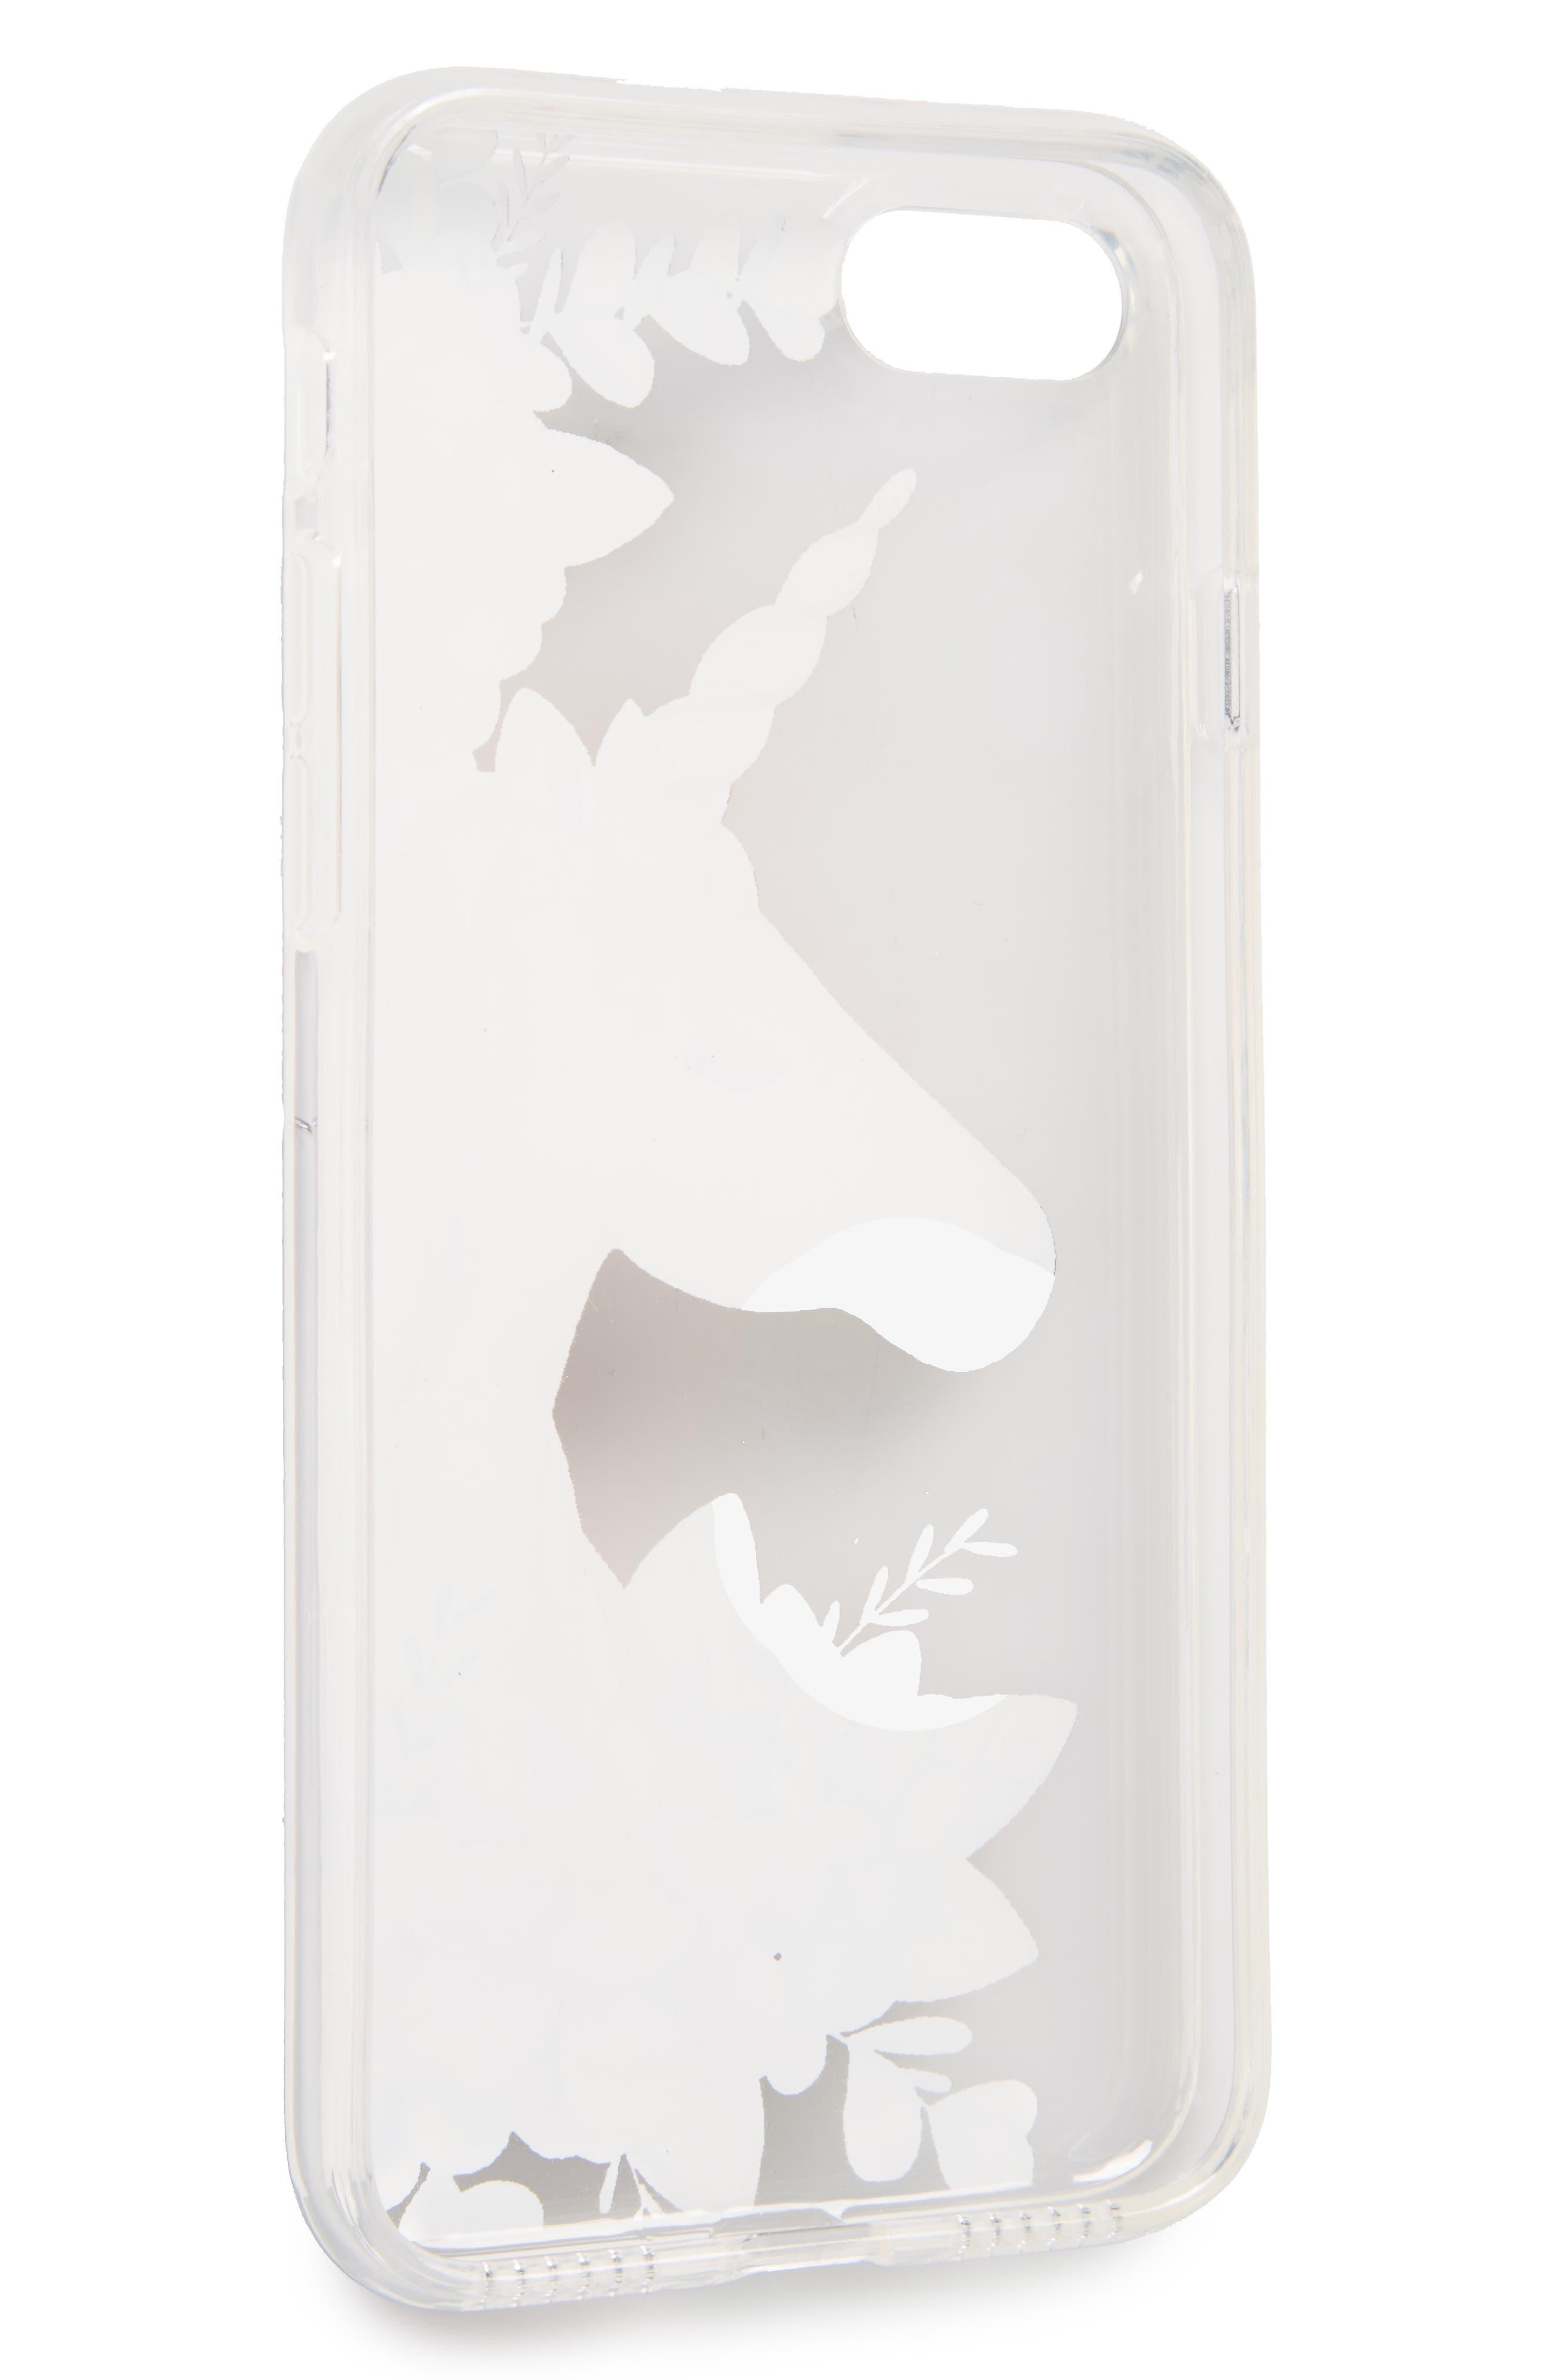 Unicorn & Flowers iPhone 7 Case,                             Alternate thumbnail 2, color,                             650